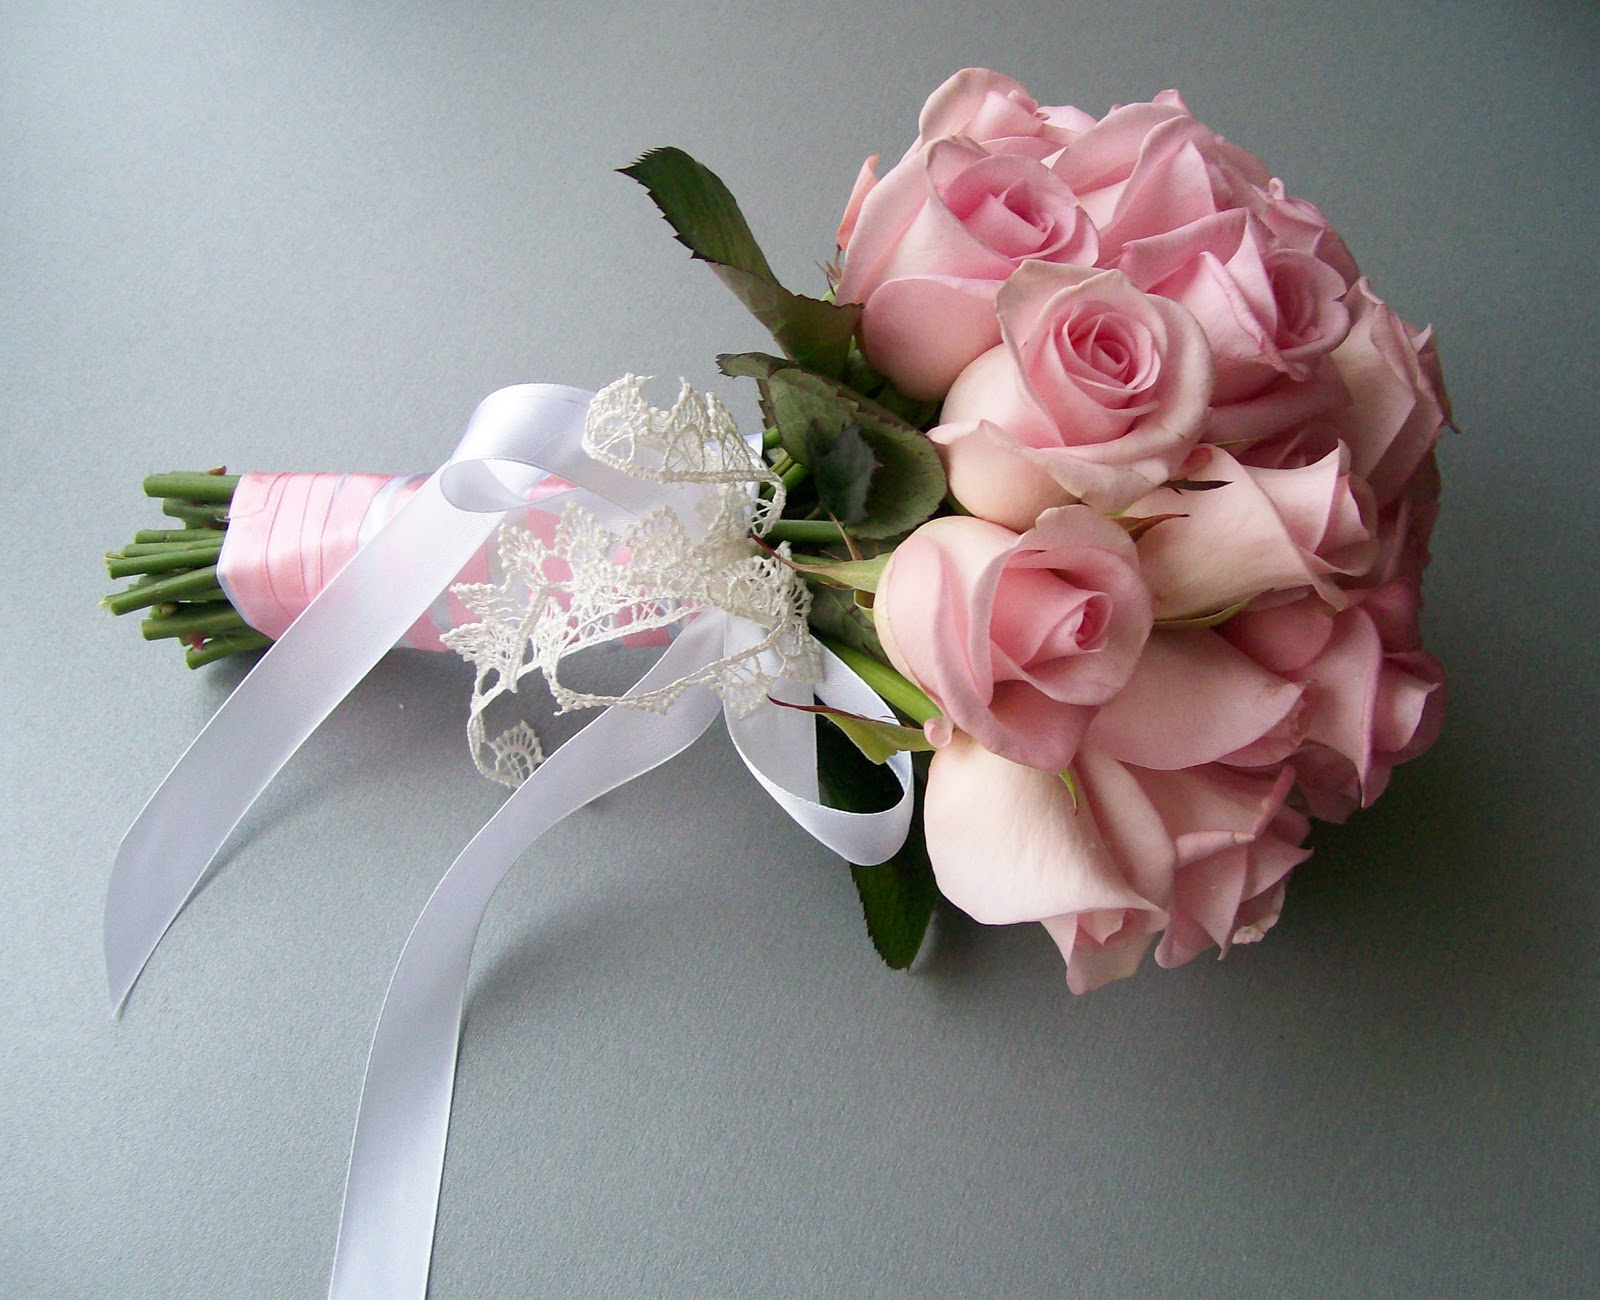 svadebnie-buketi-iz-malenkih-rozovih-rozochek-dostavka-podarkov-odessa-skorohodov